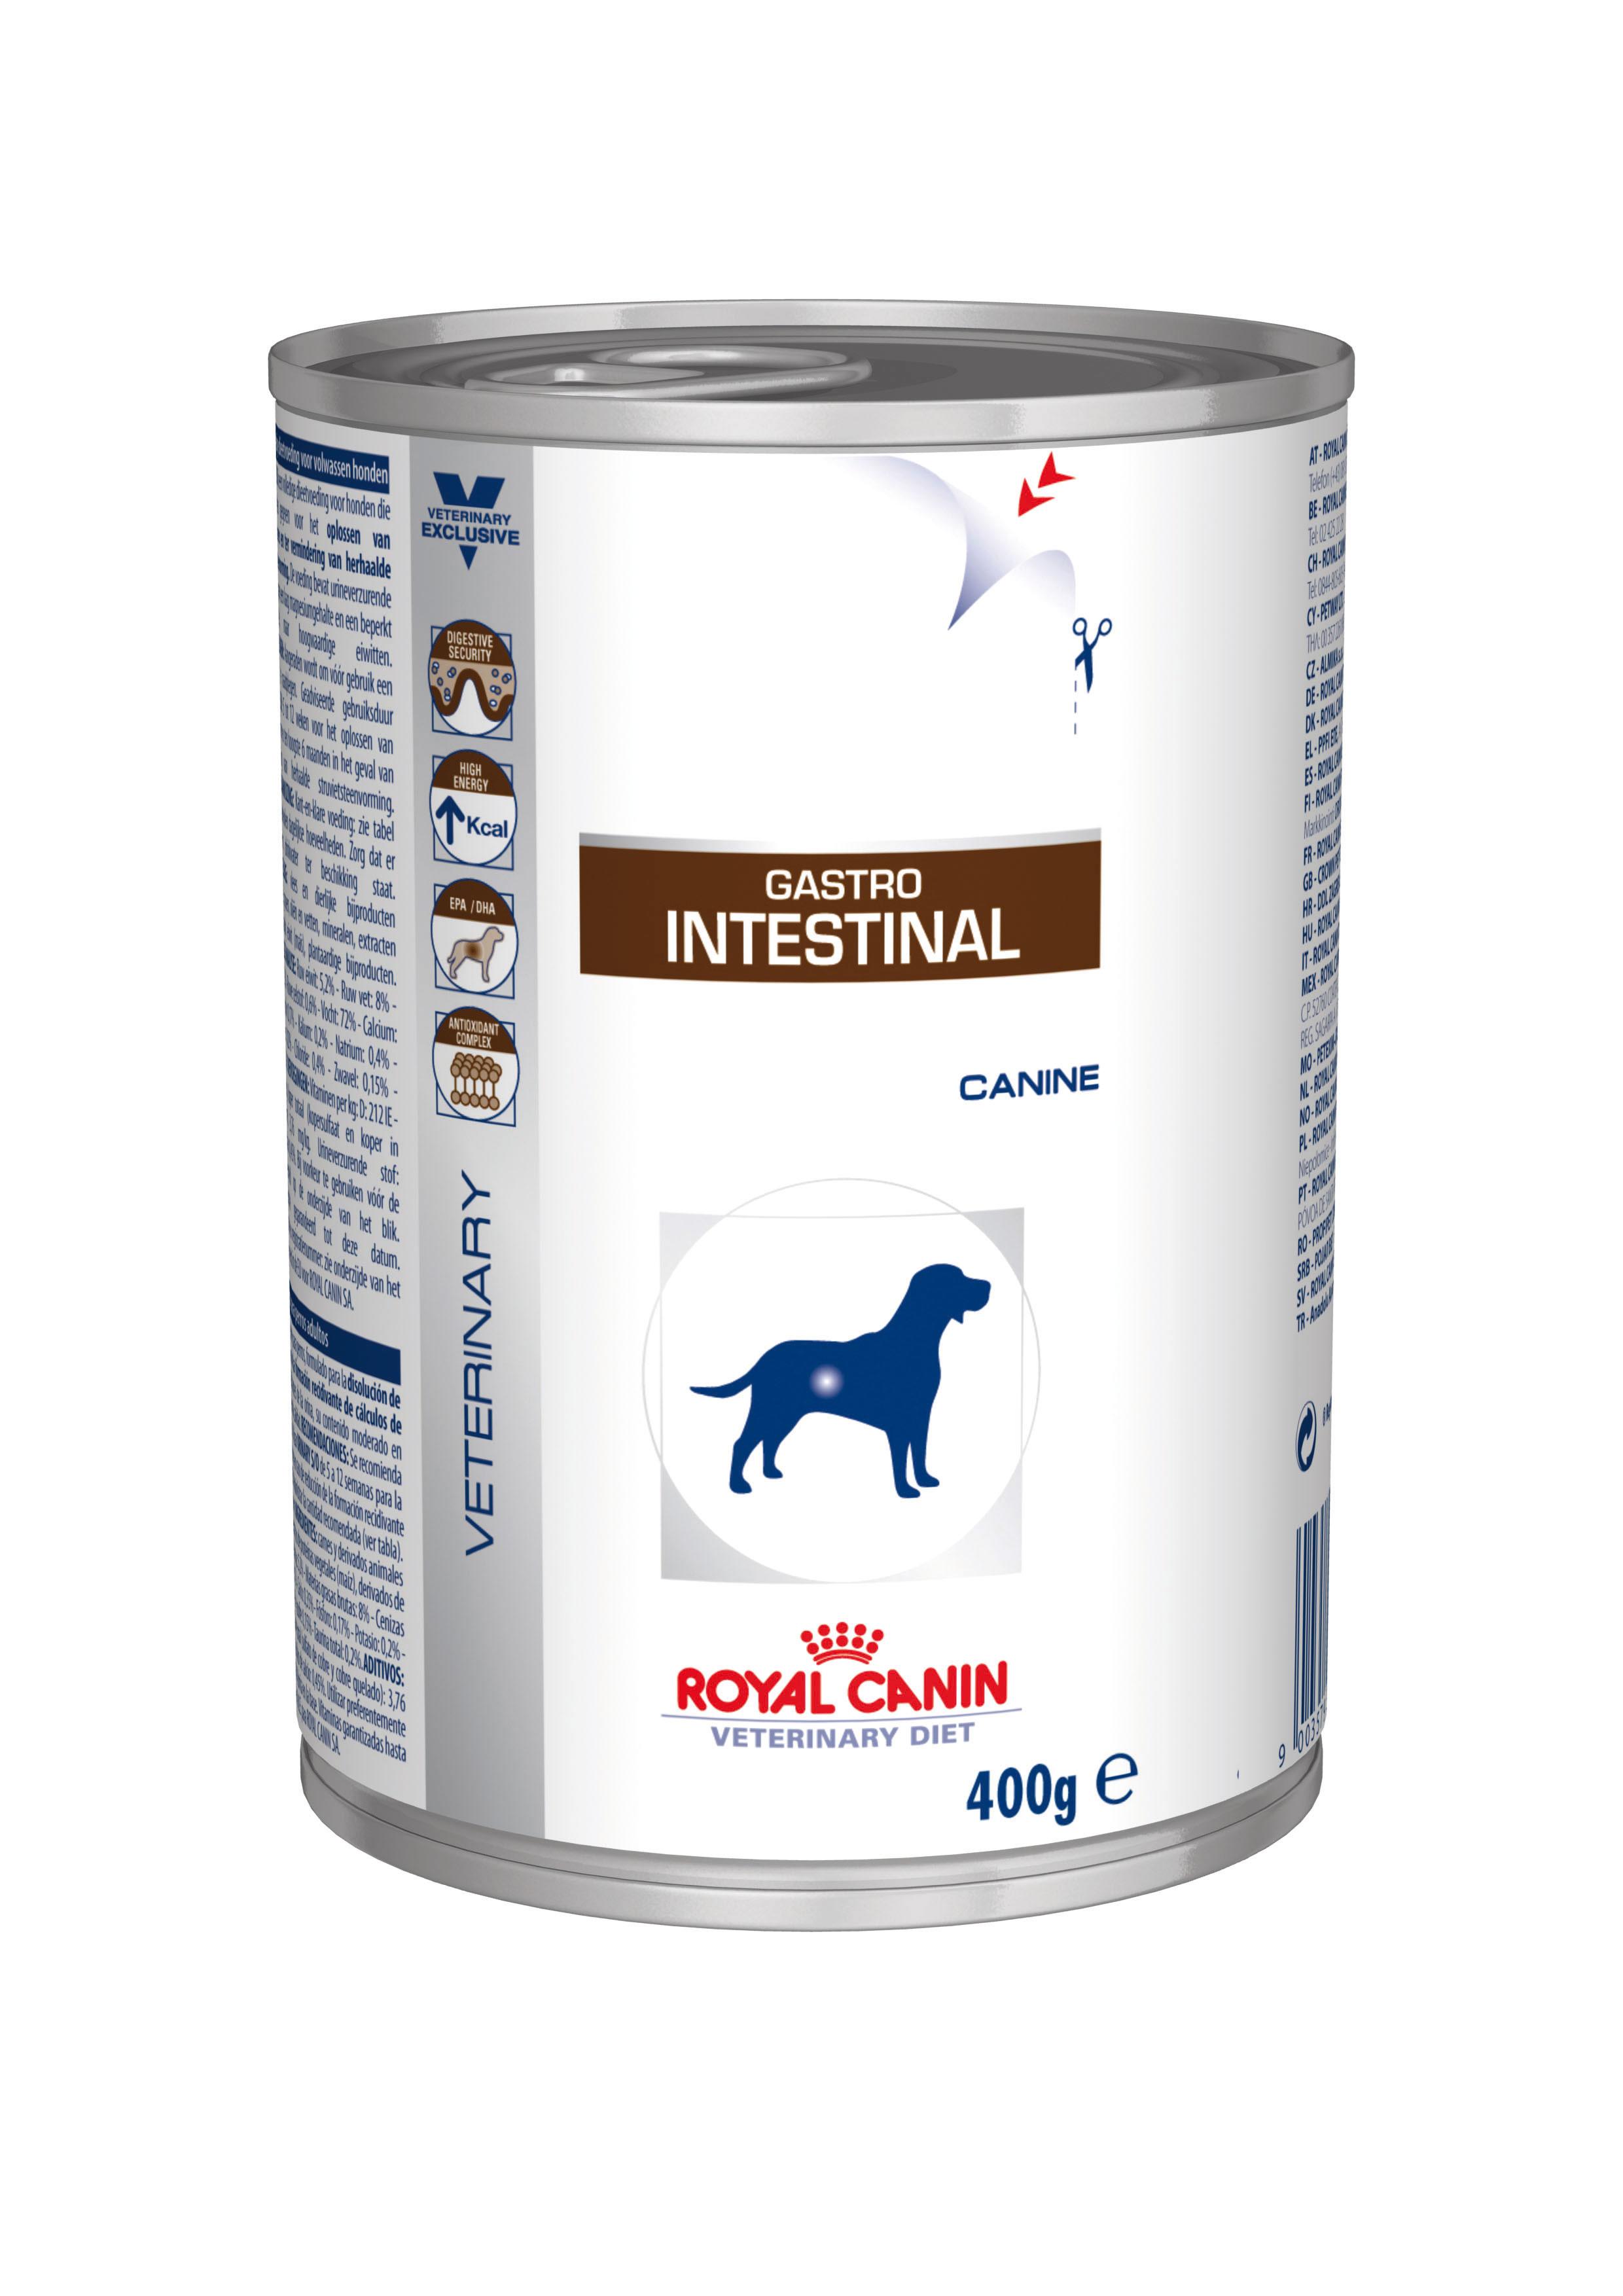 Canine Gasto Intestinal Wet